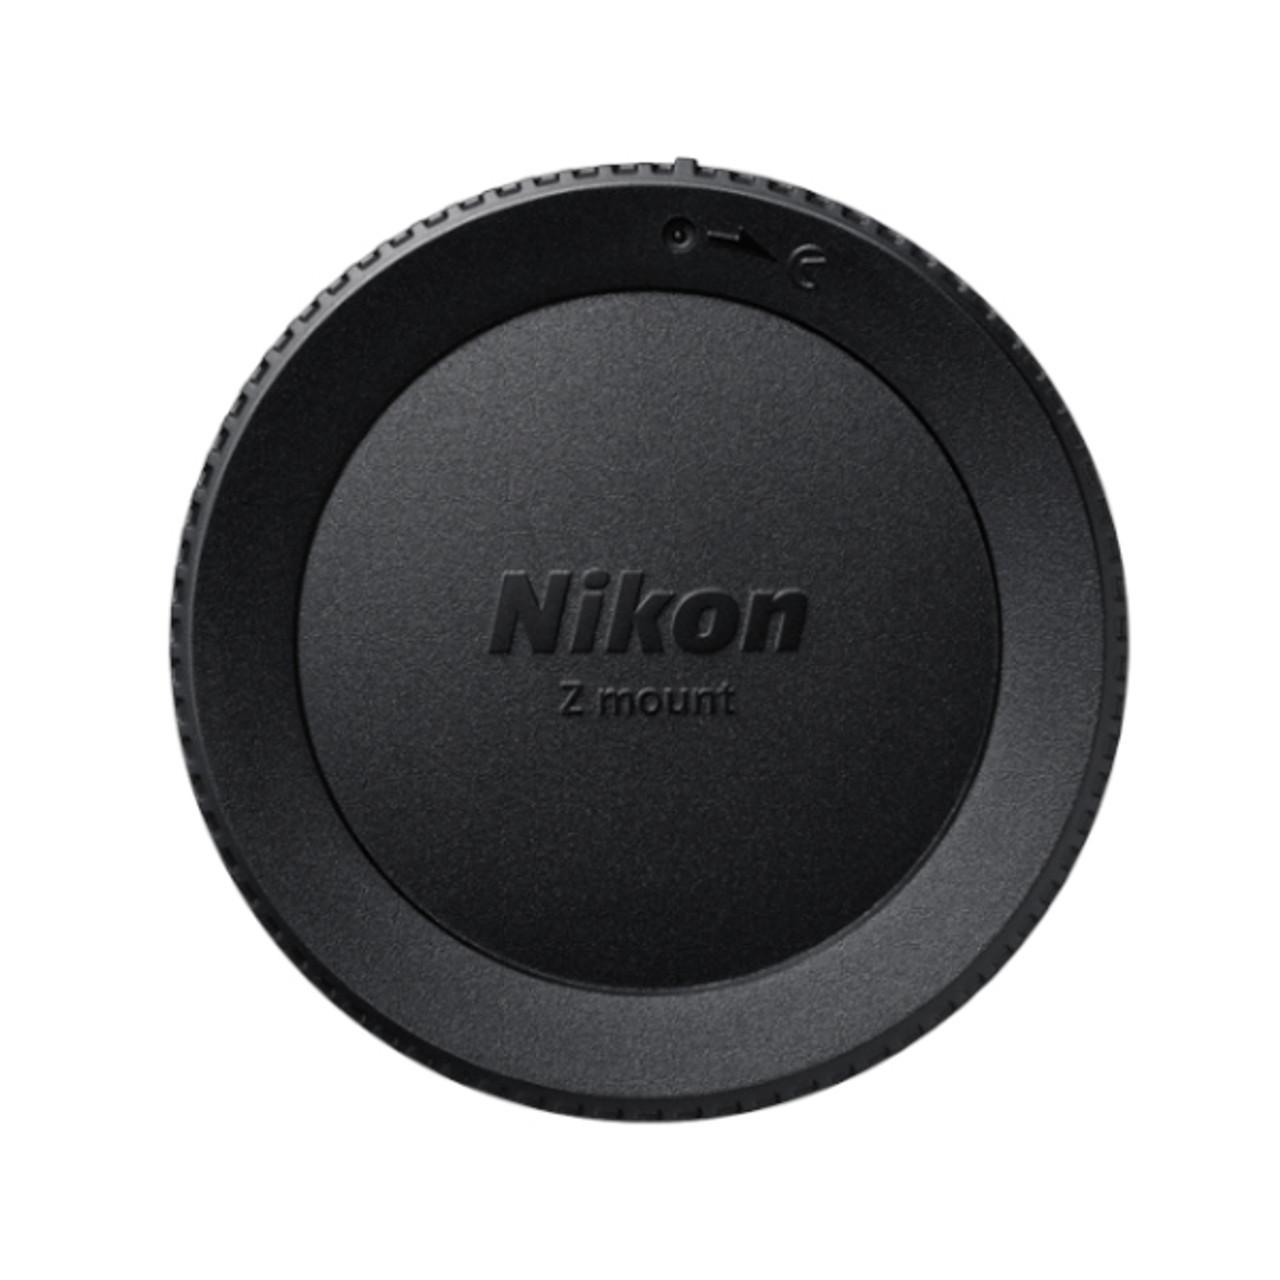 Nikon BF-N1 Body Cap for Nikon Z